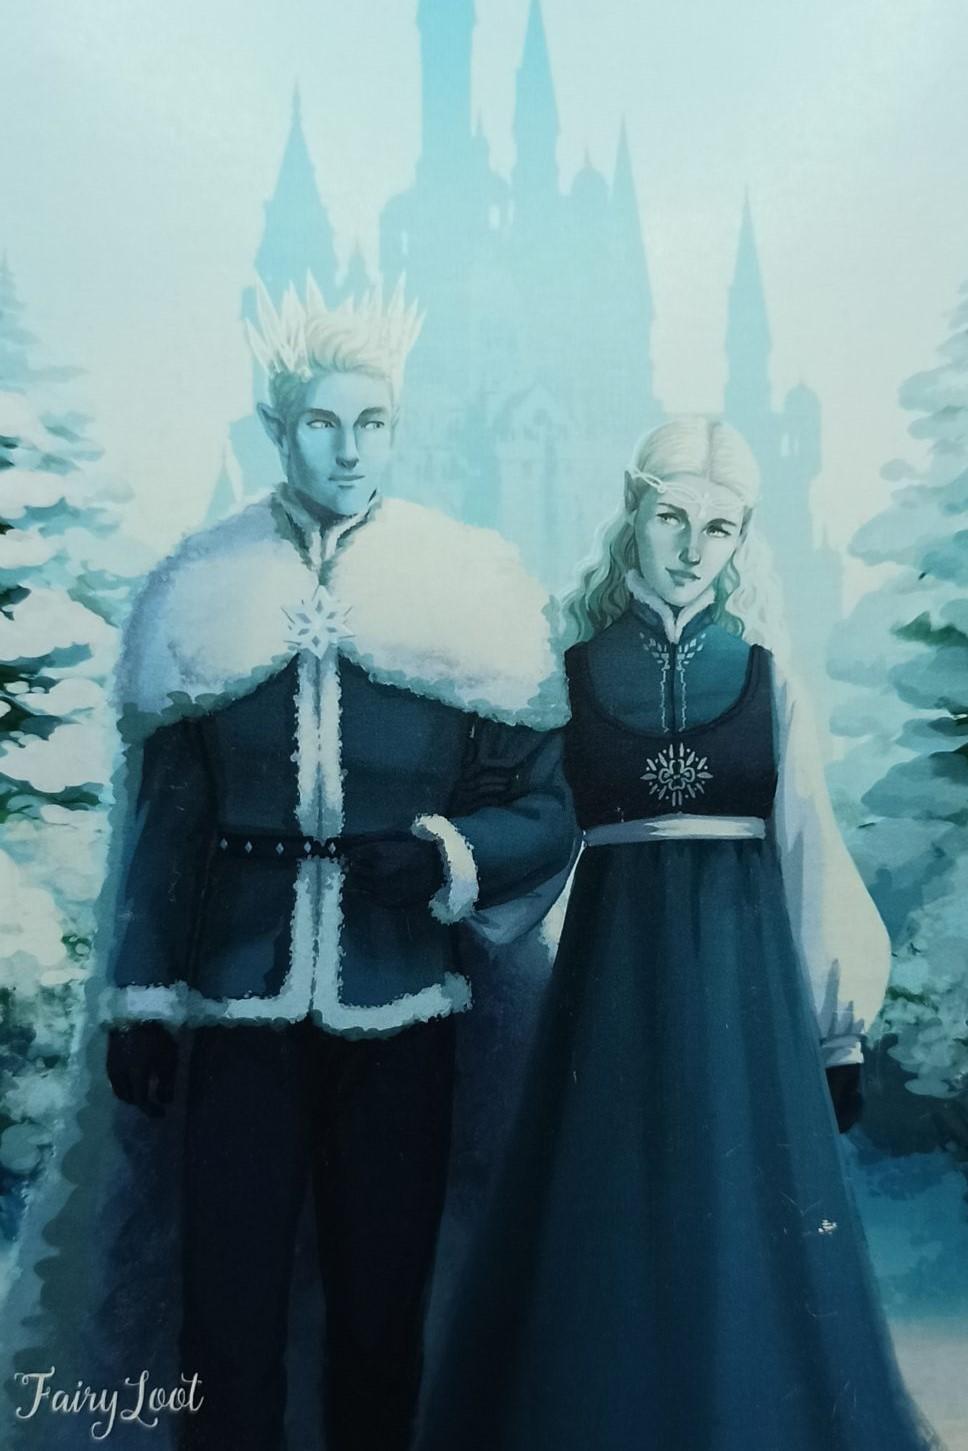 [Unboxing] Fairyloot March 2021: Frozen Fables